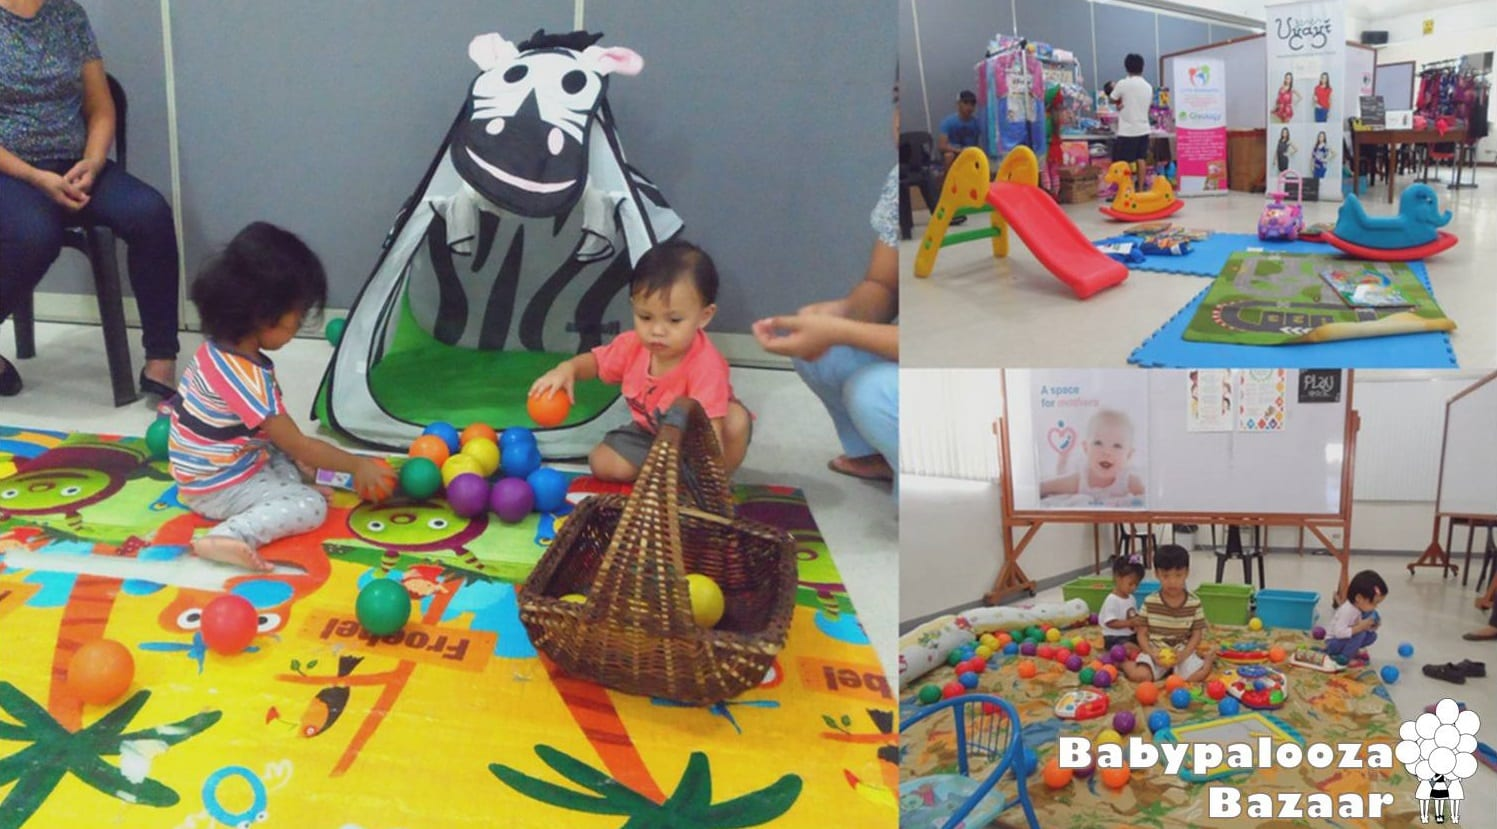 Babypalooza Bazaar kids